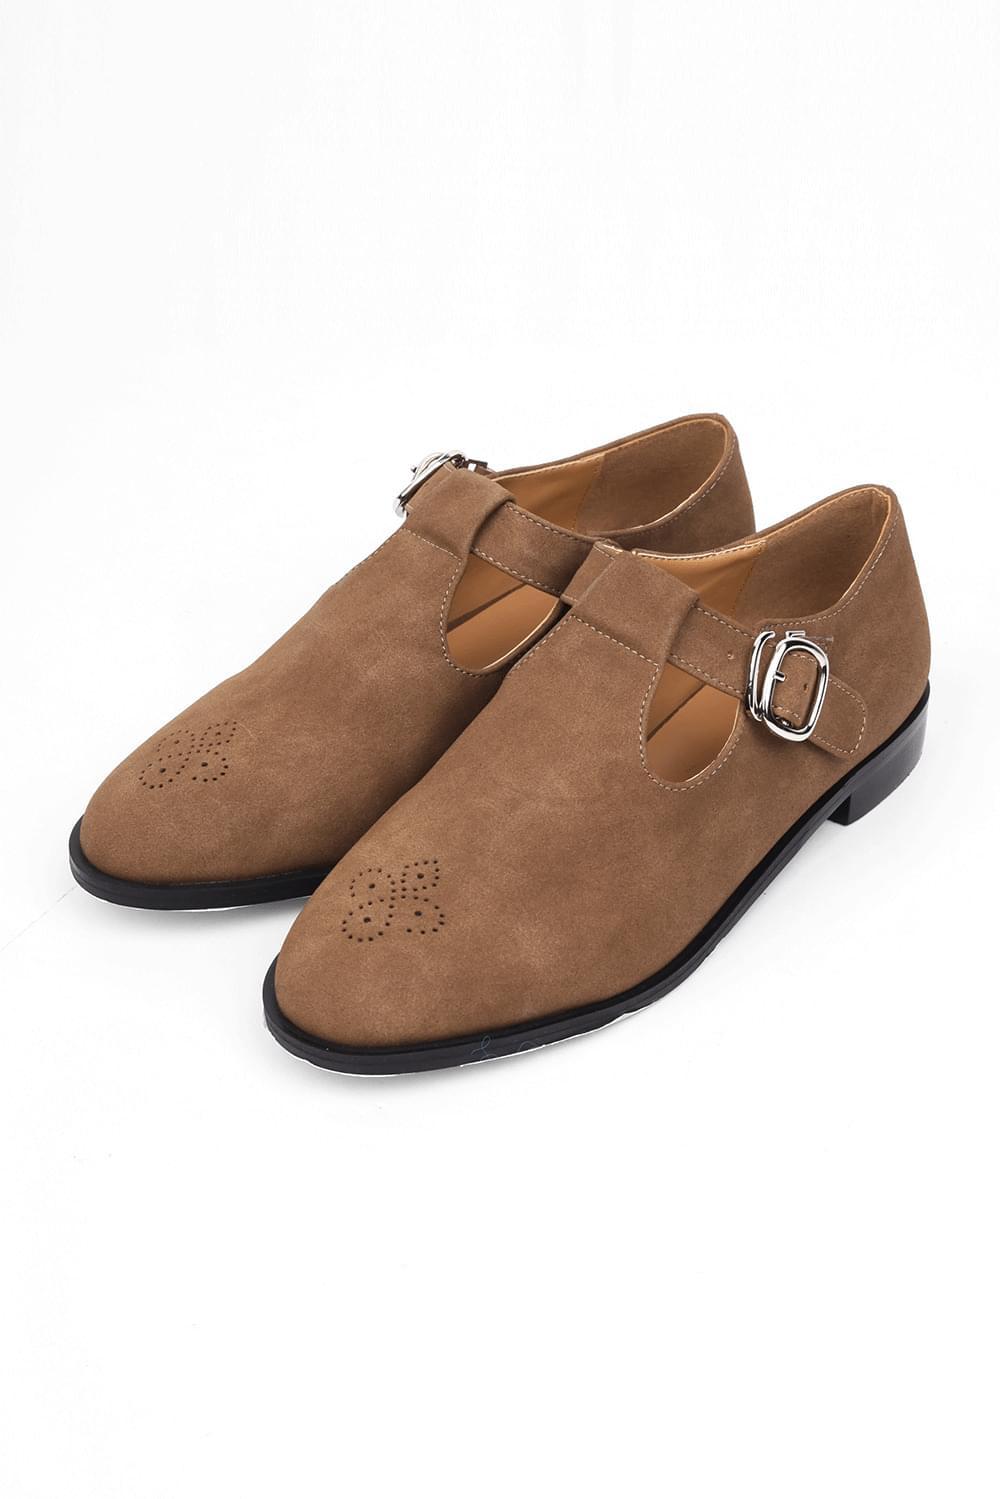 matt strap loafer (2colors)